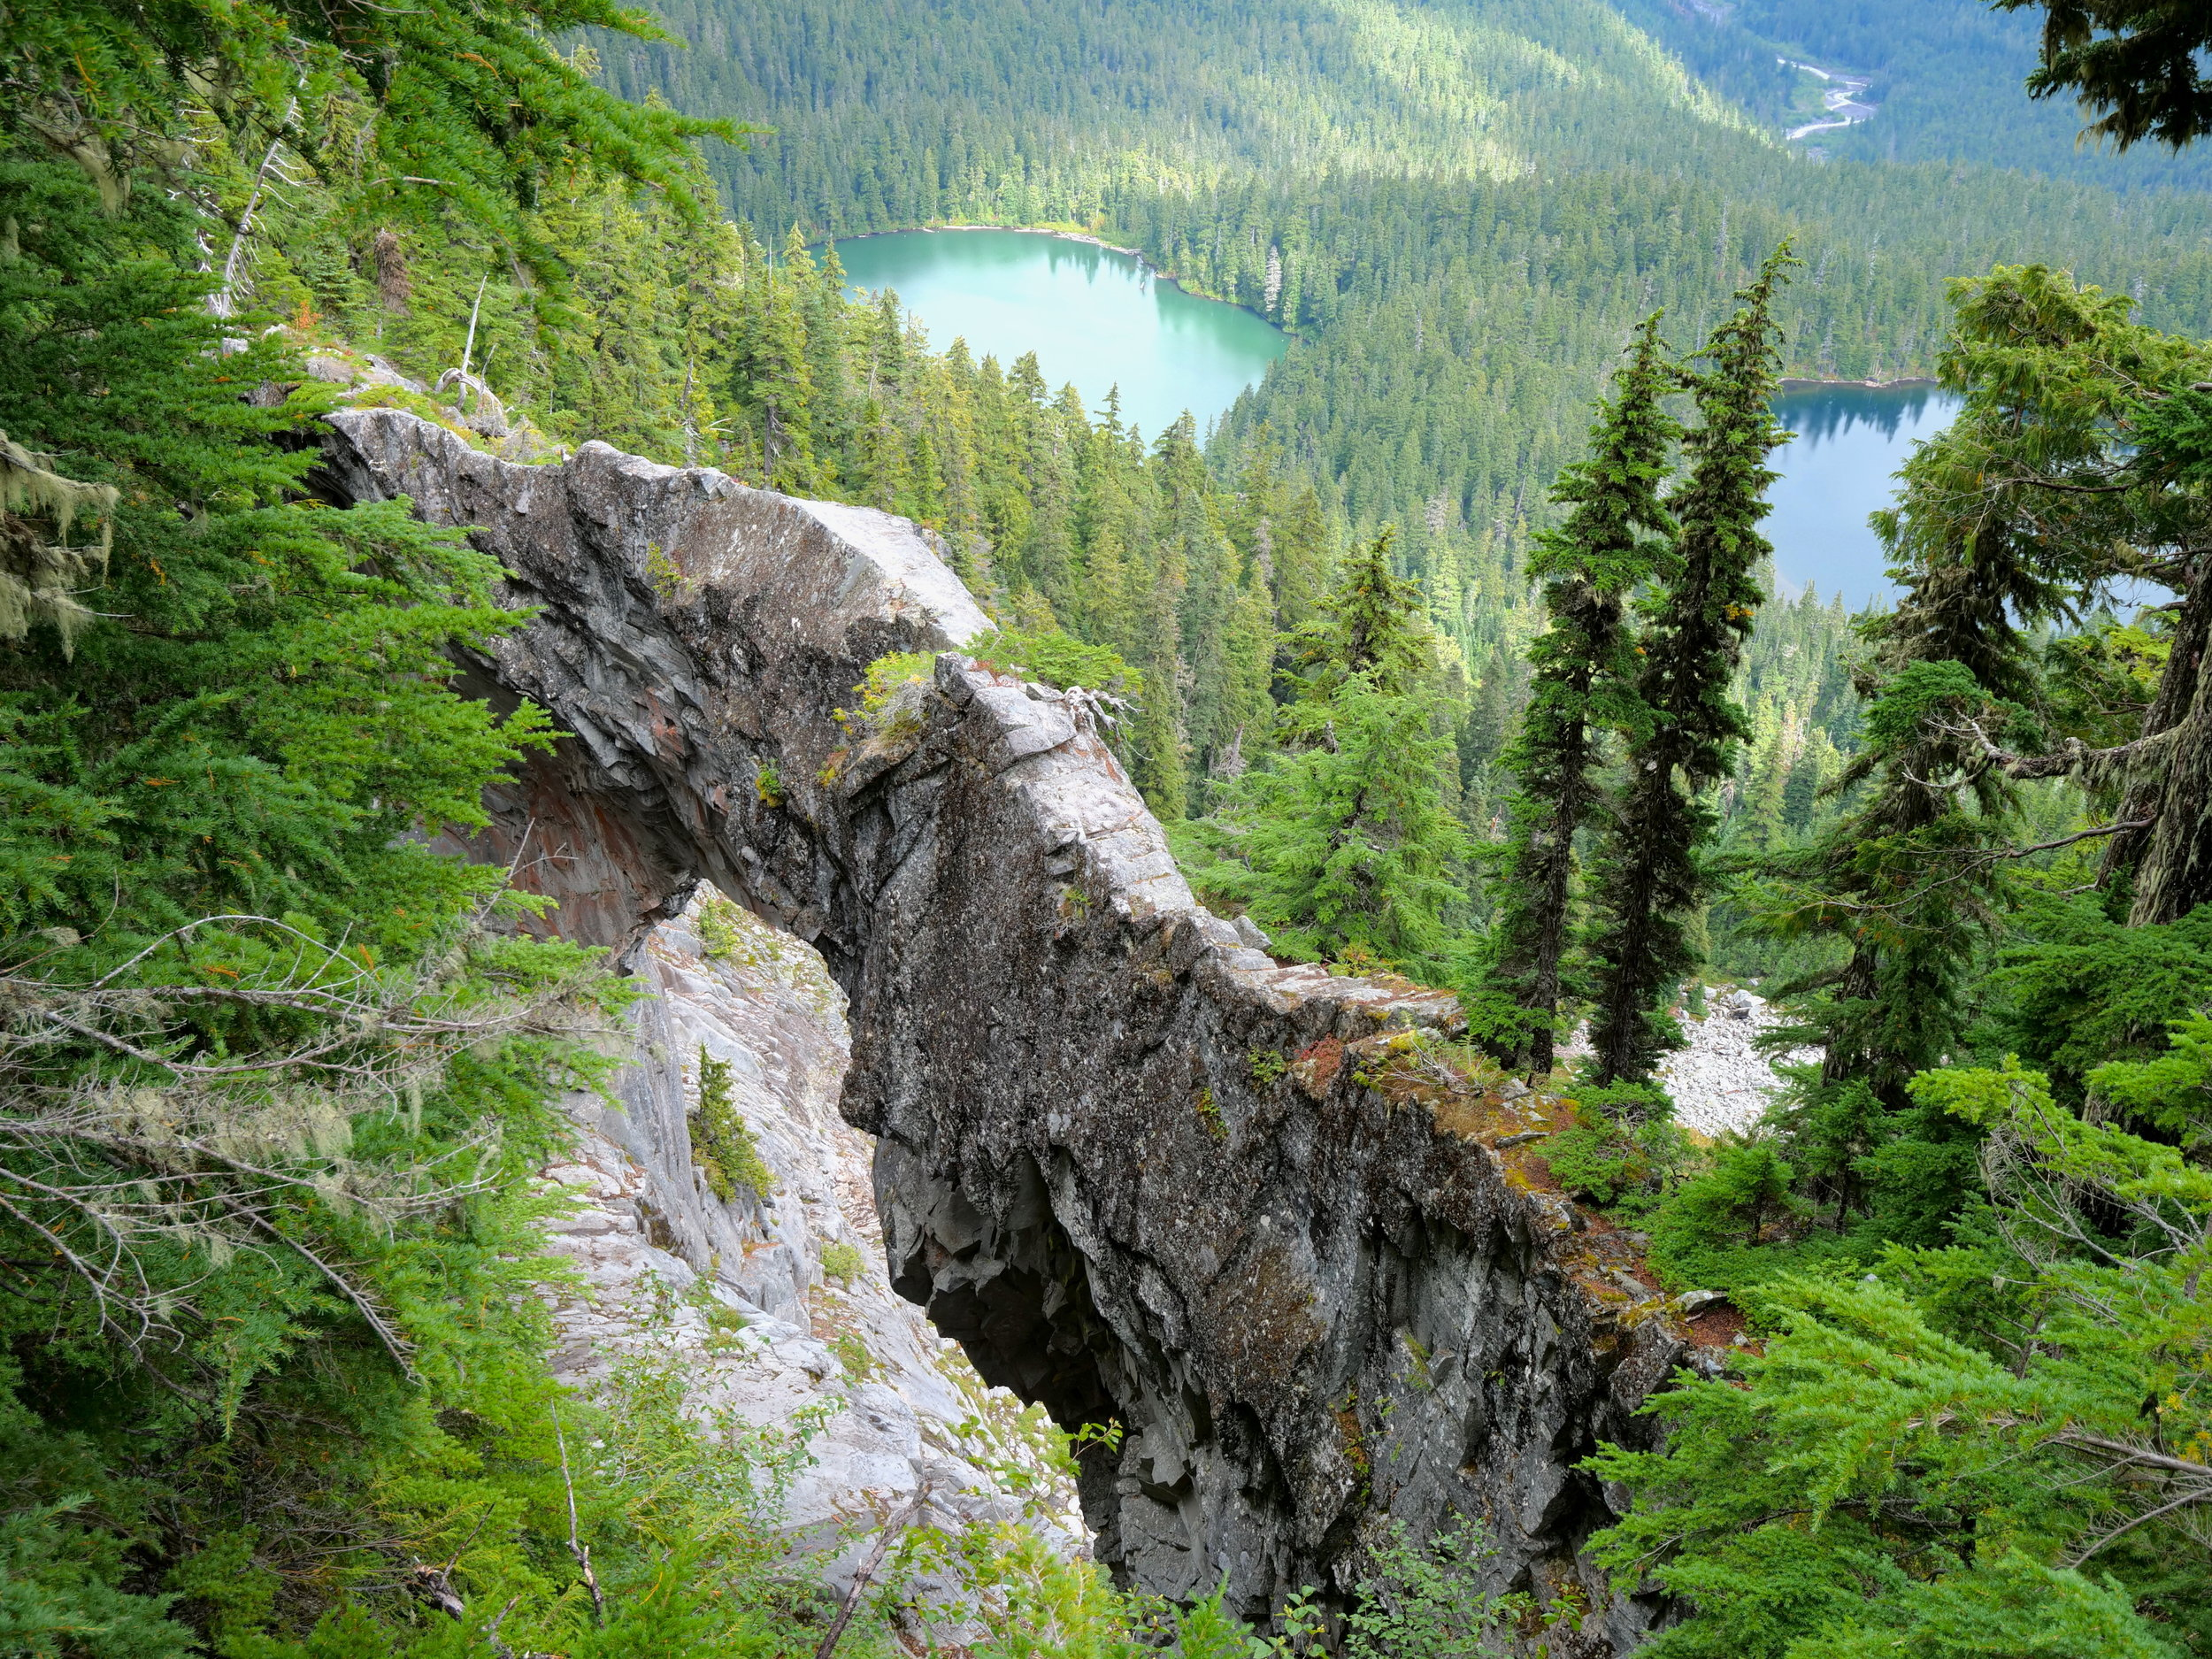 Natural Bridge with Lakes Ethel and James below